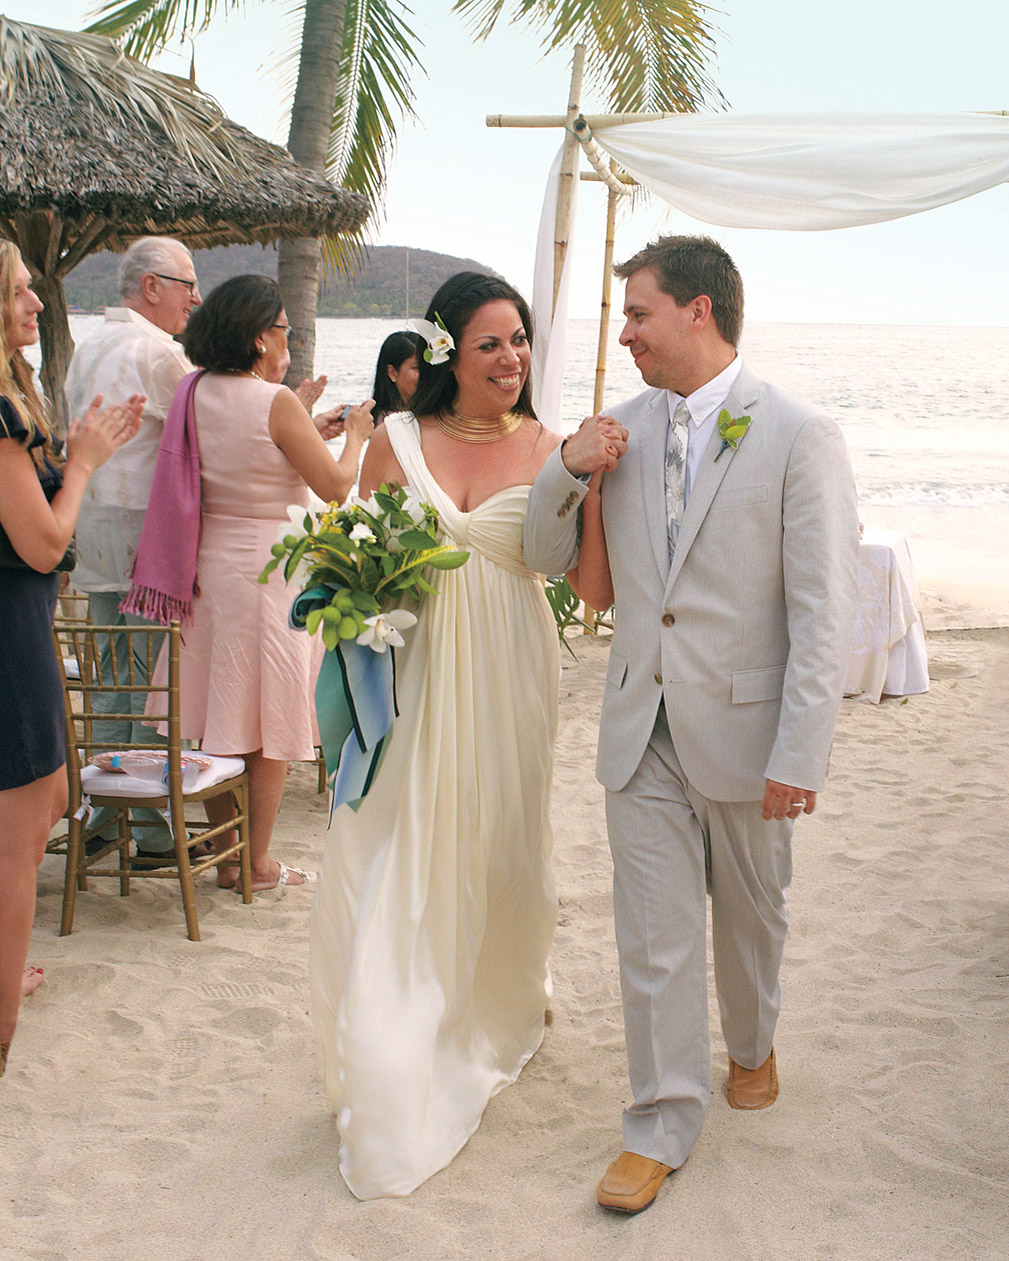 rw-mexico-bride-groom-2-mwds107779.jpg